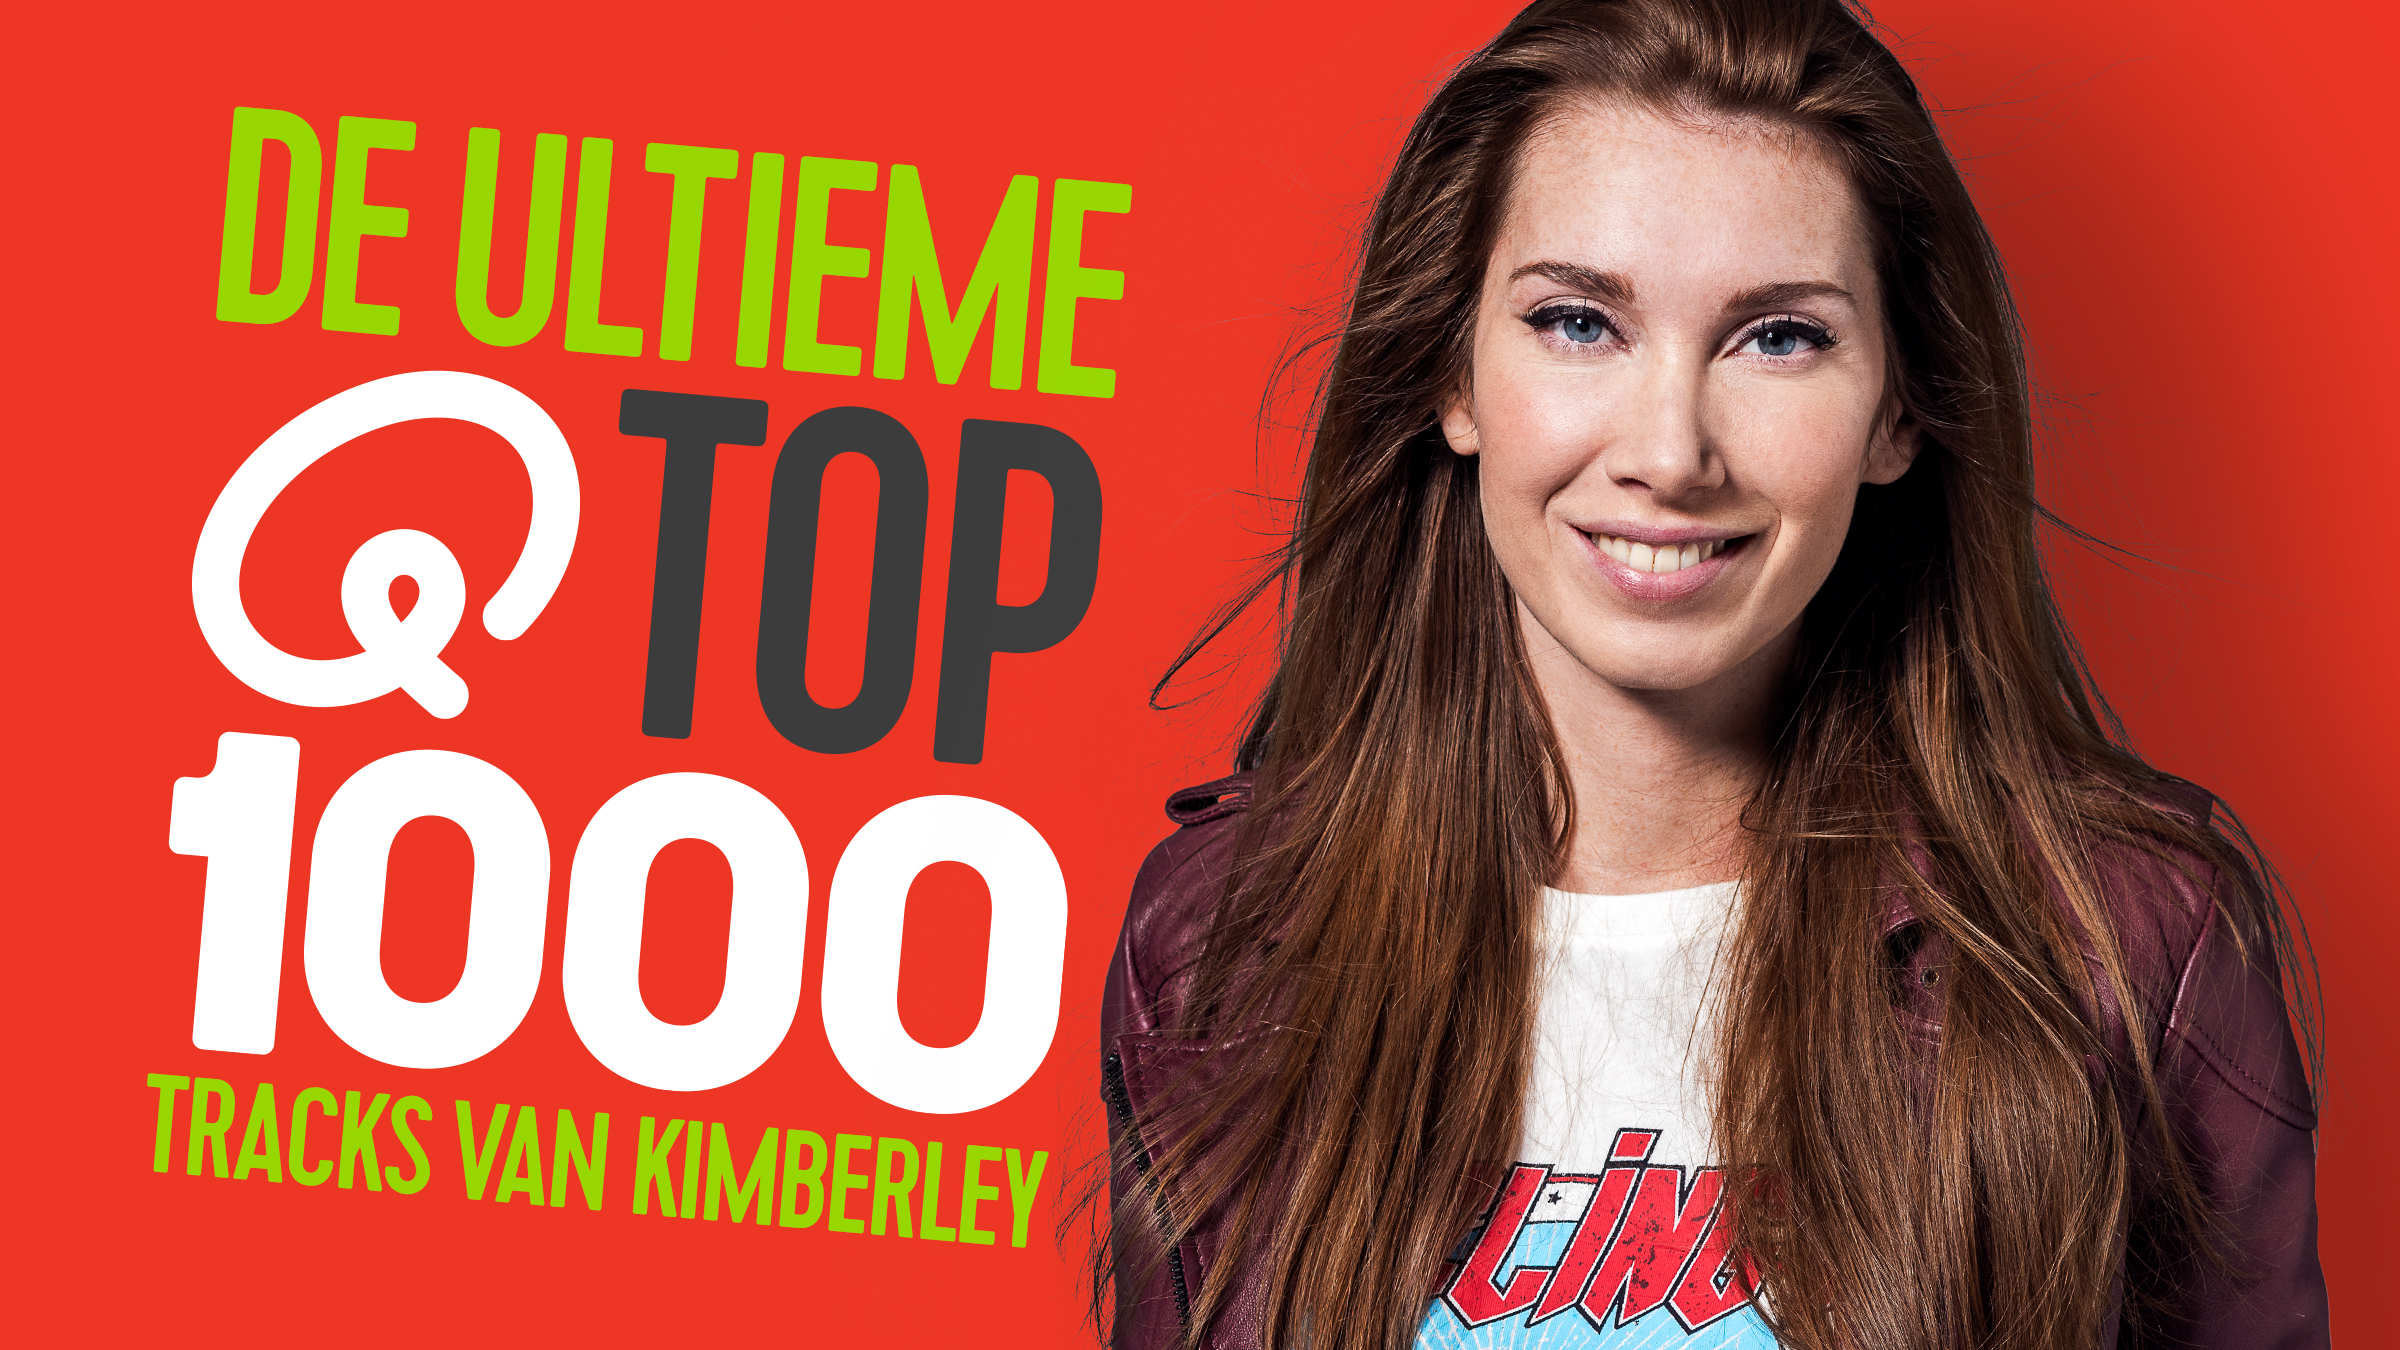 Qmusic teaser qtop1000 dj kimberley